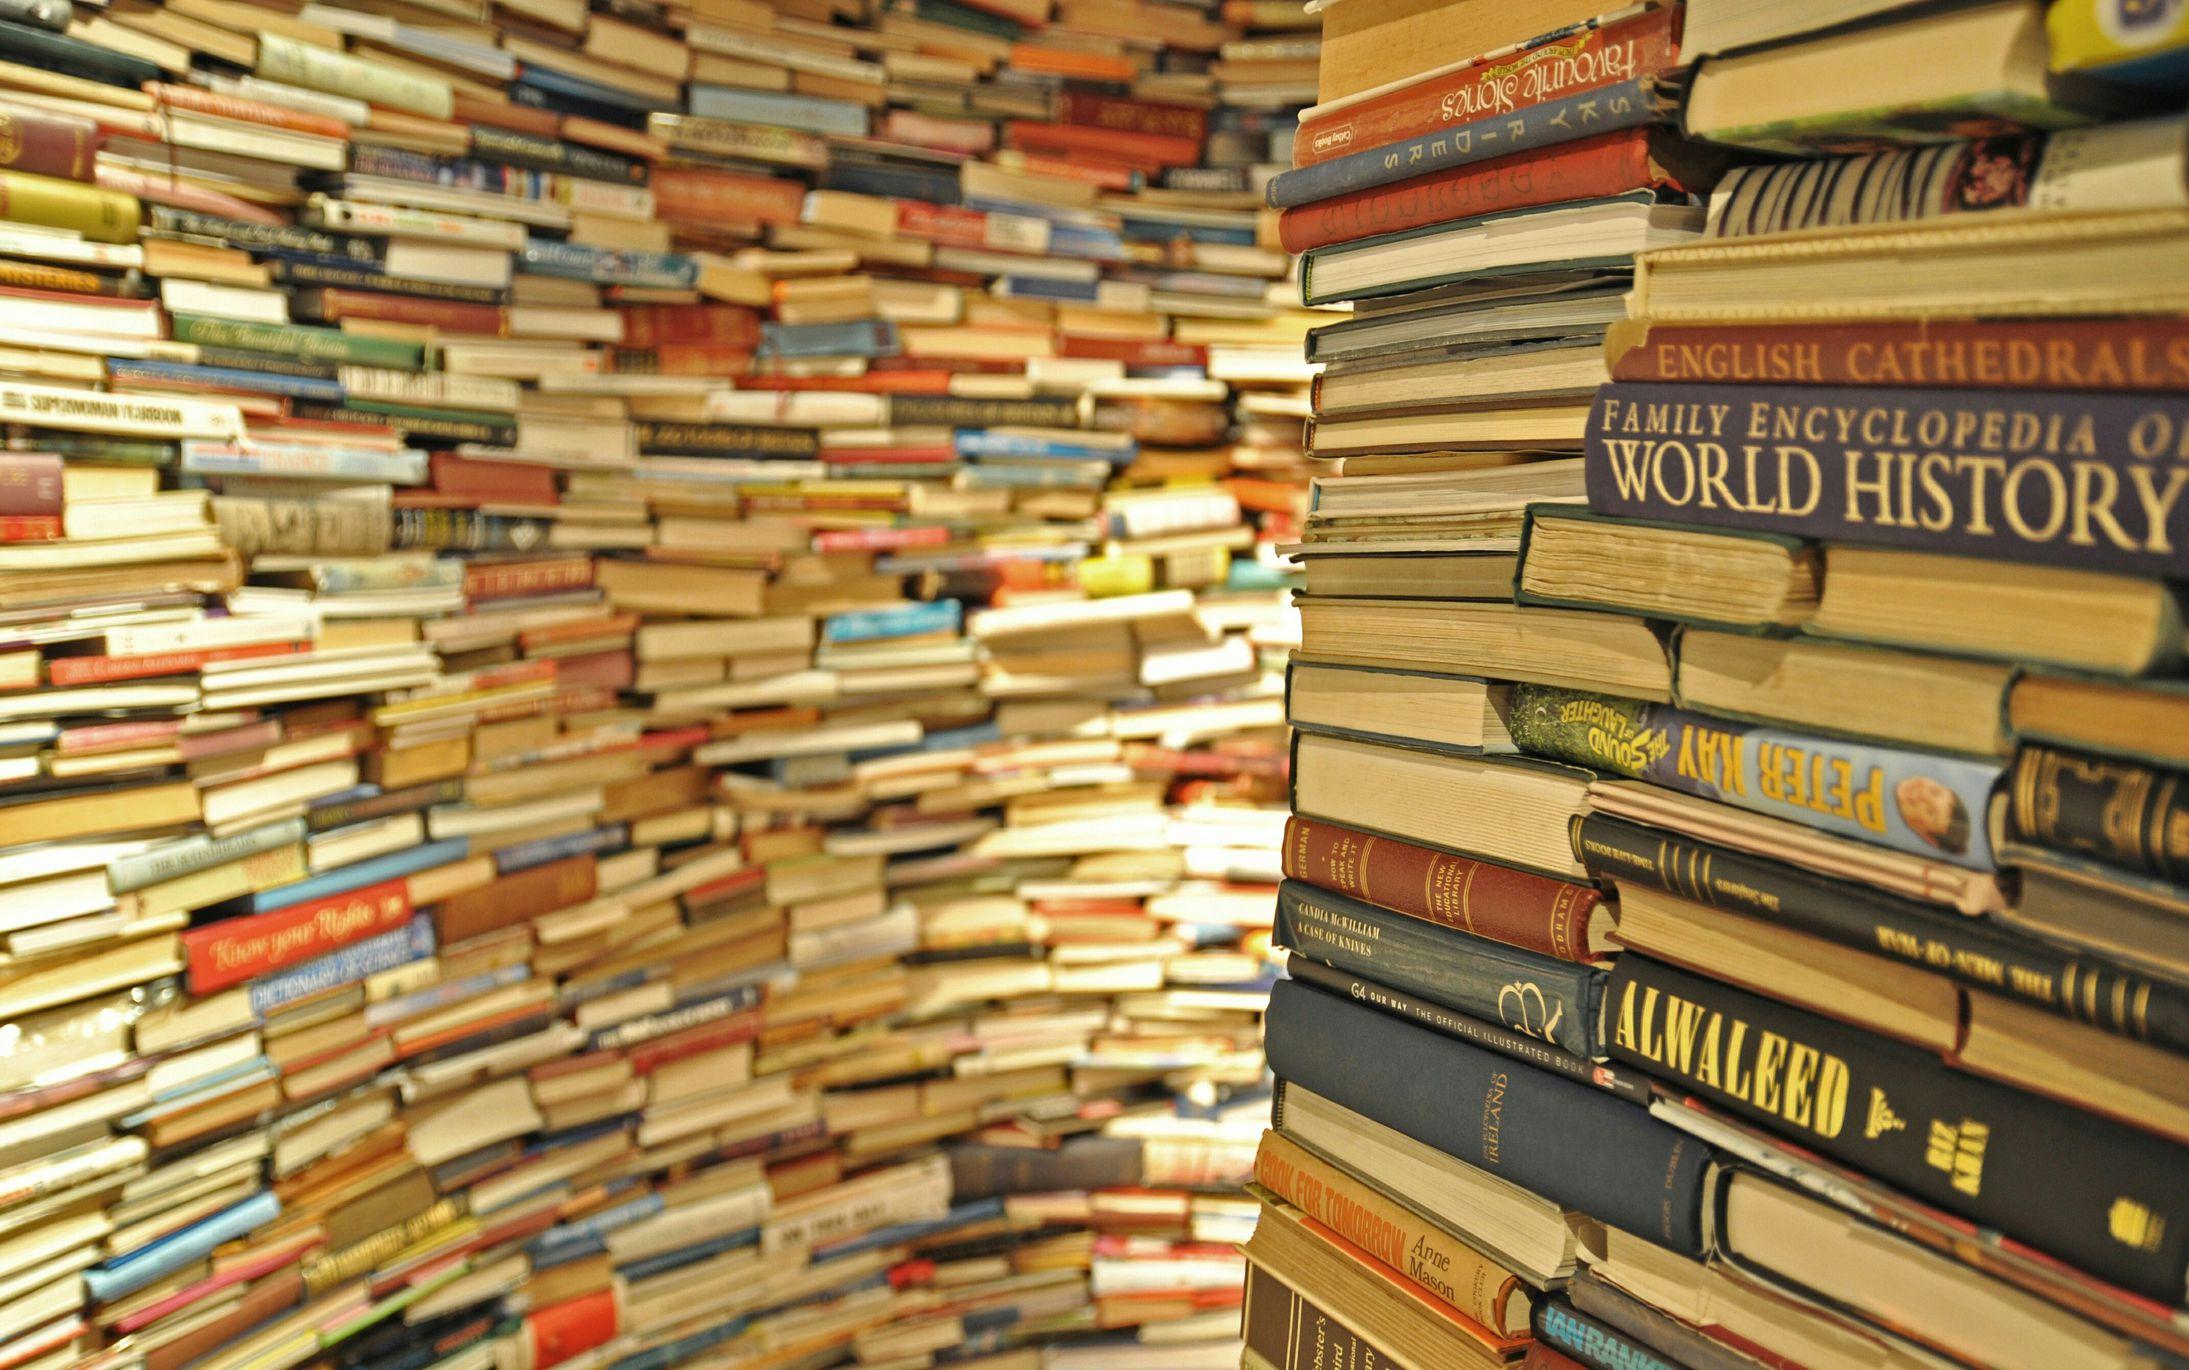 cheap paperback books online Books on art, manga, wicca, spells, paganism, history, new books.